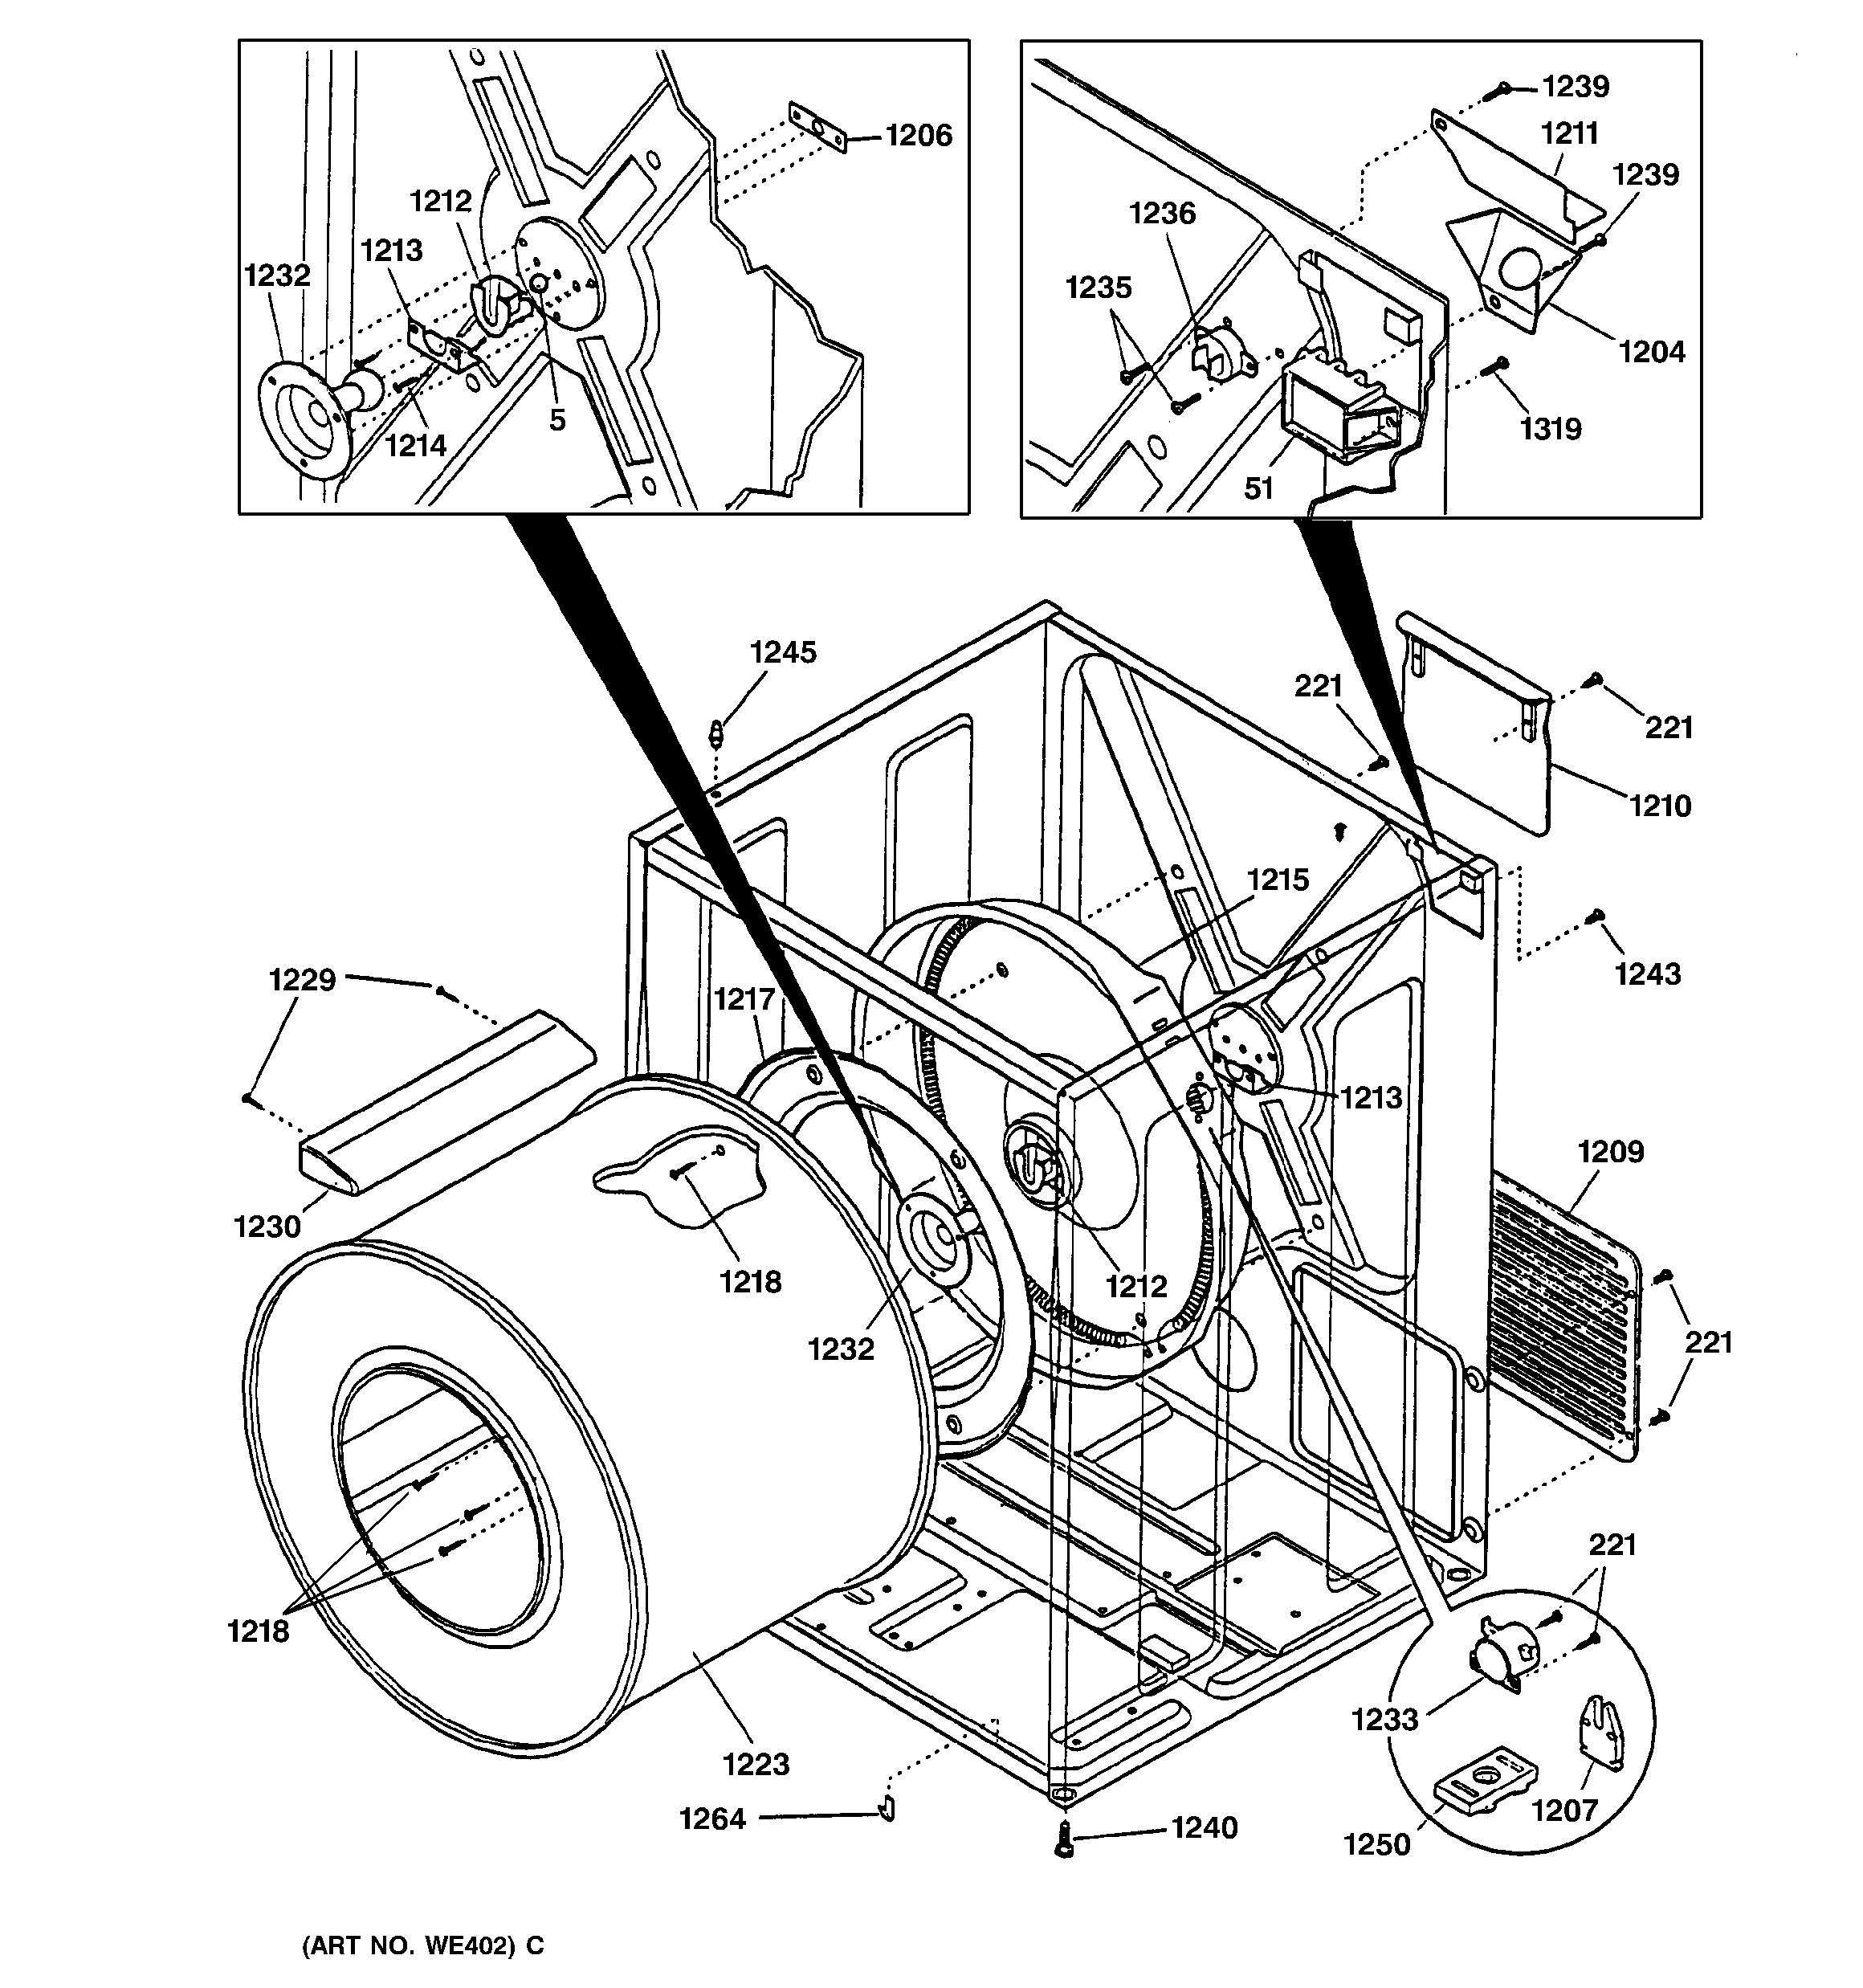 General Electric Dishwasher Parts Diagram